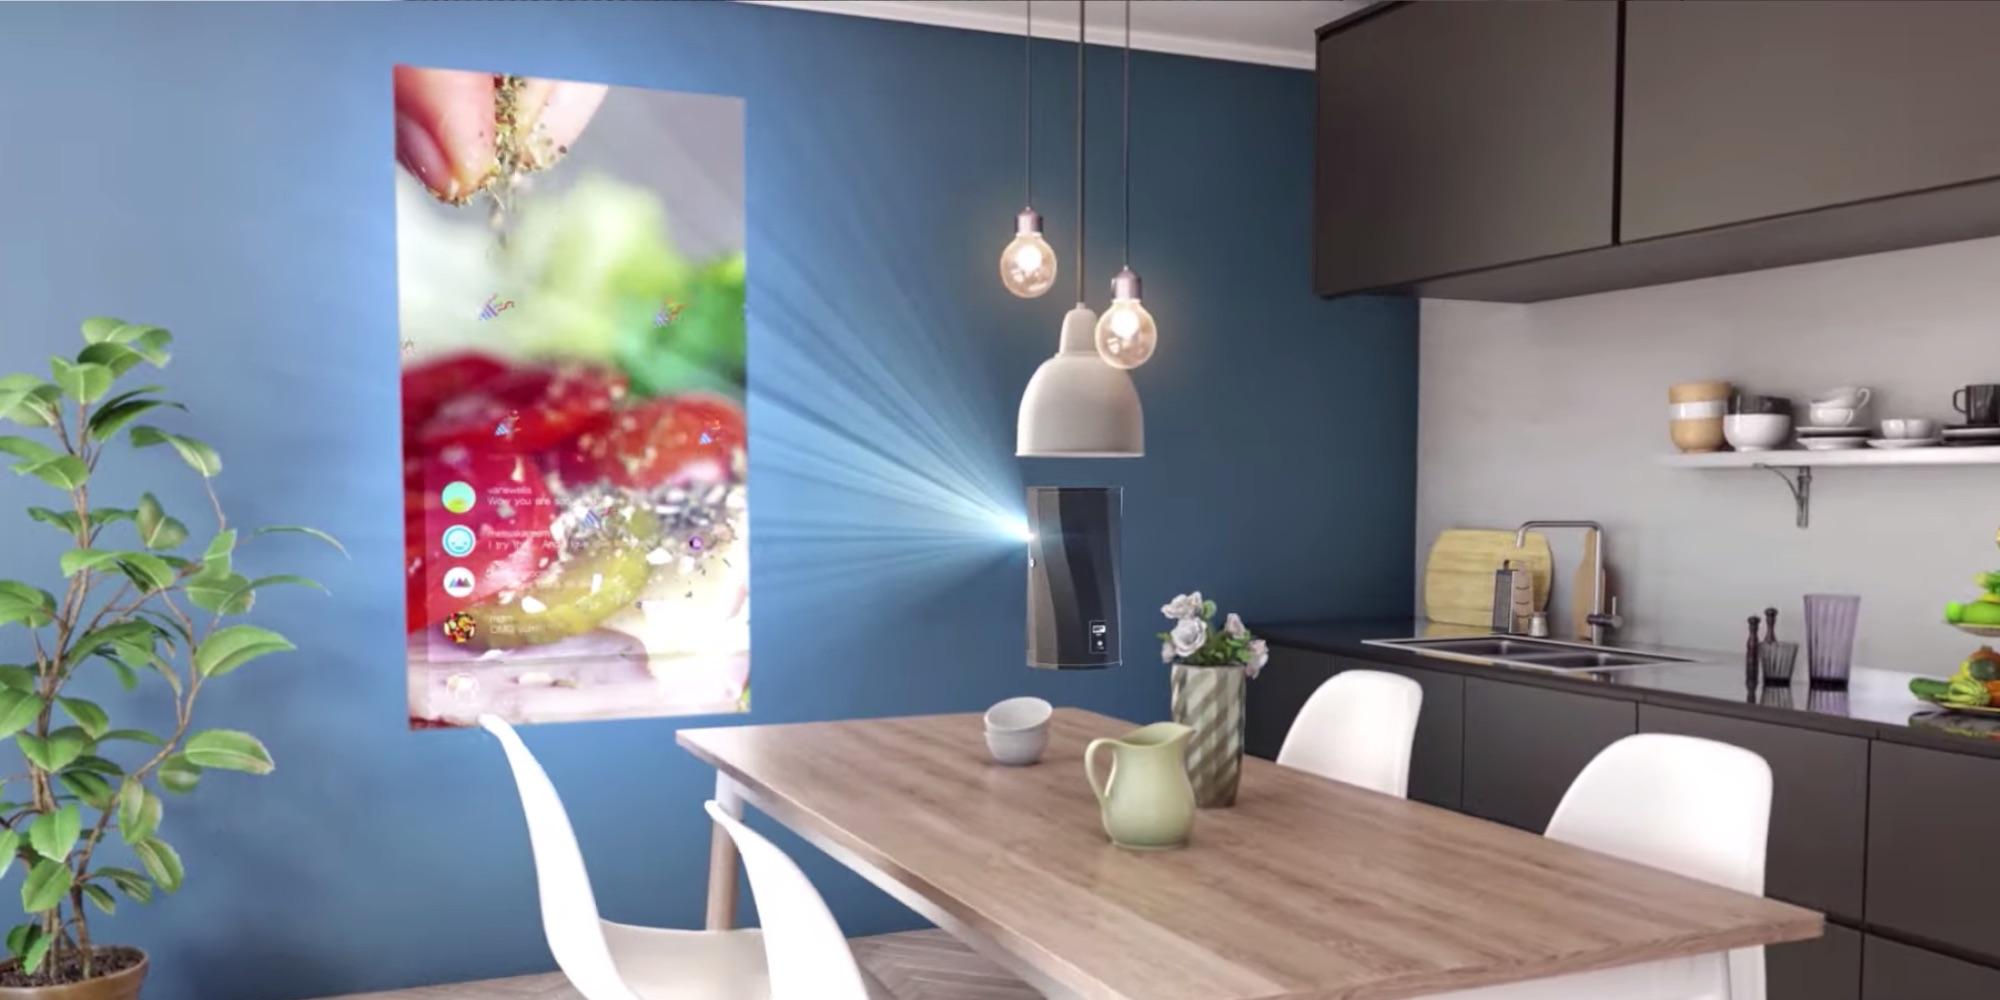 Acer C250i: โปรเจ็กเตอร์ LED แบบพกพาสำหรับสมาร์ทโฟน - Geek Tech Online